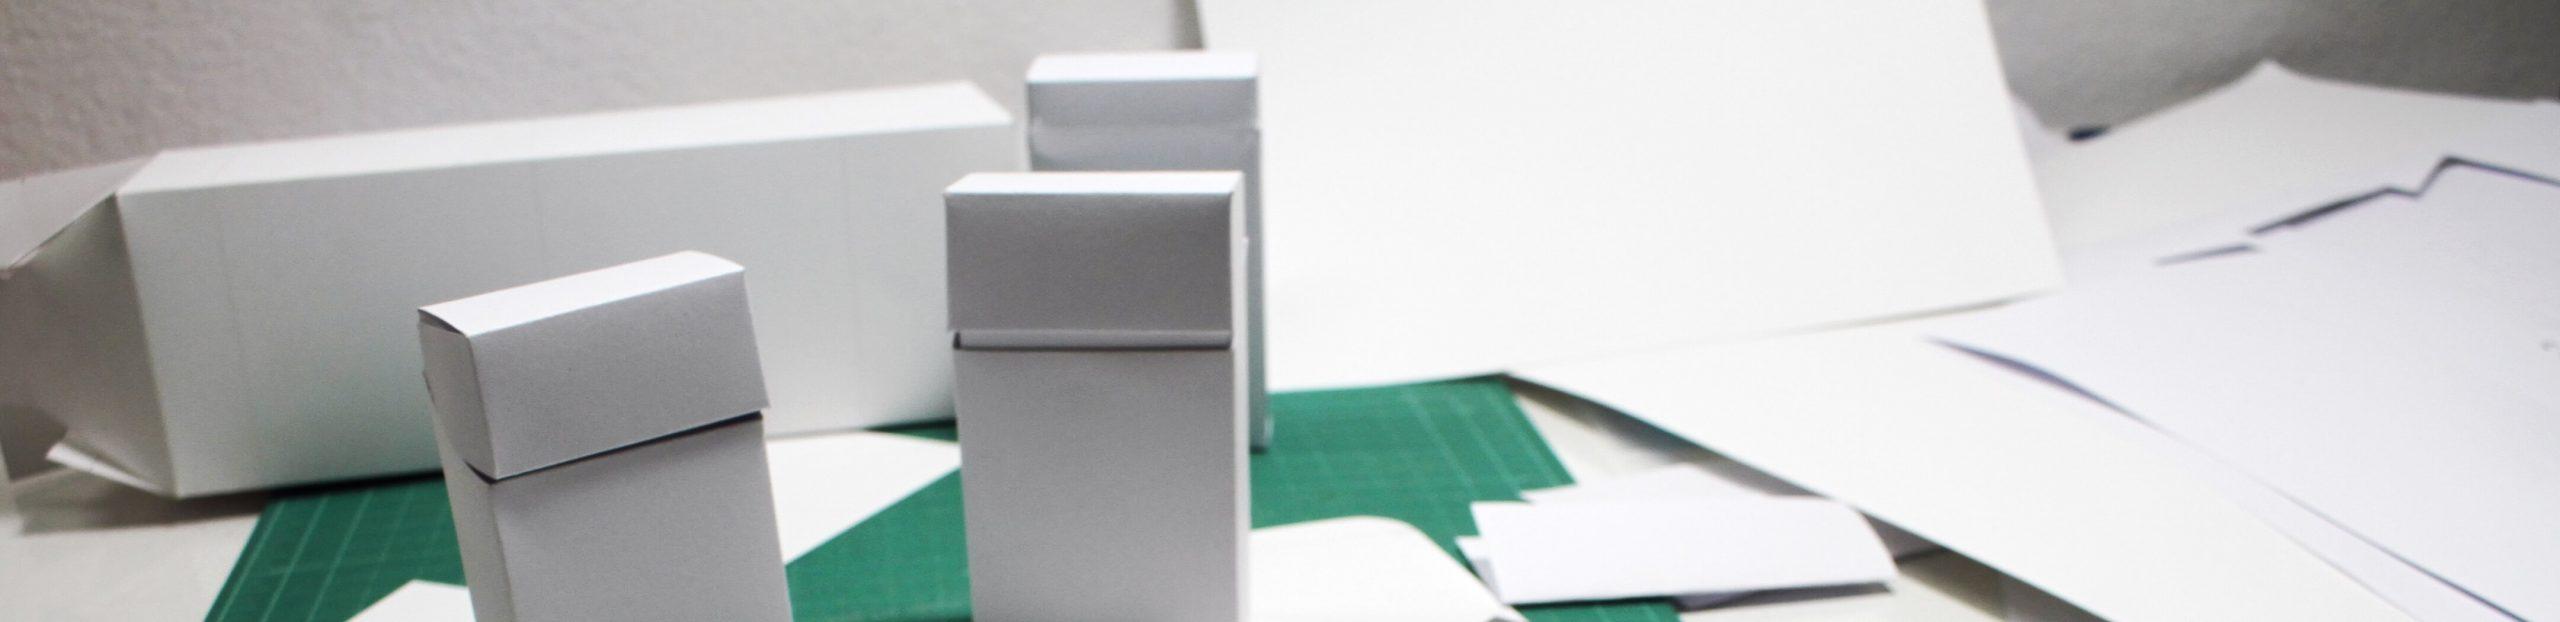 Spectrum Packaging 3D Paper Design Concept